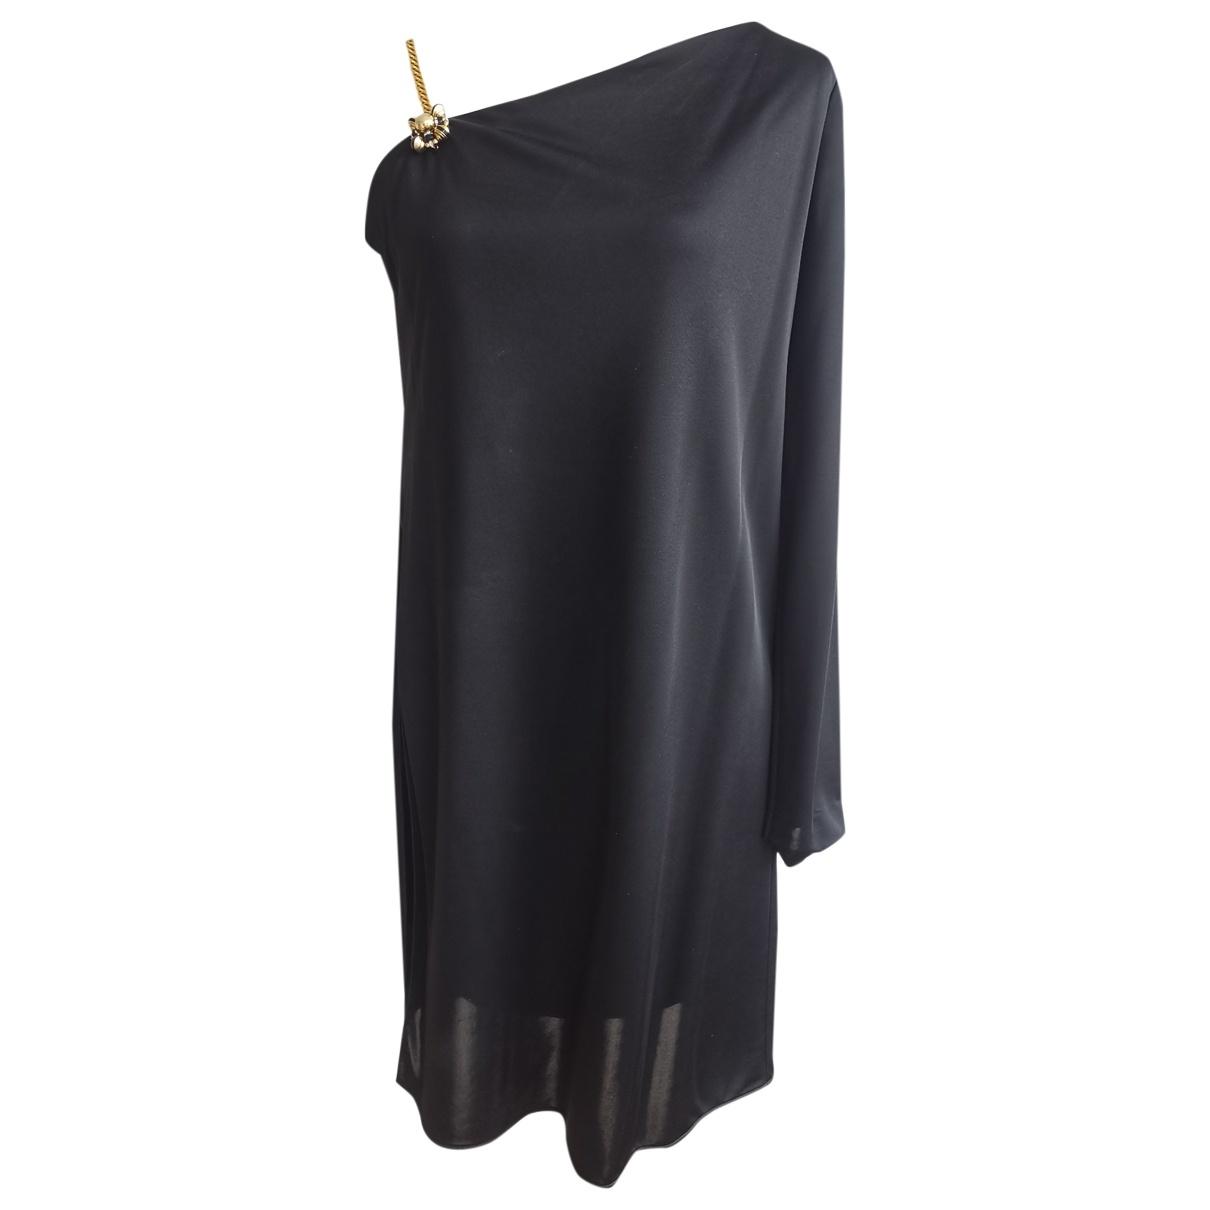 Gucci \N Black dress for Women M International